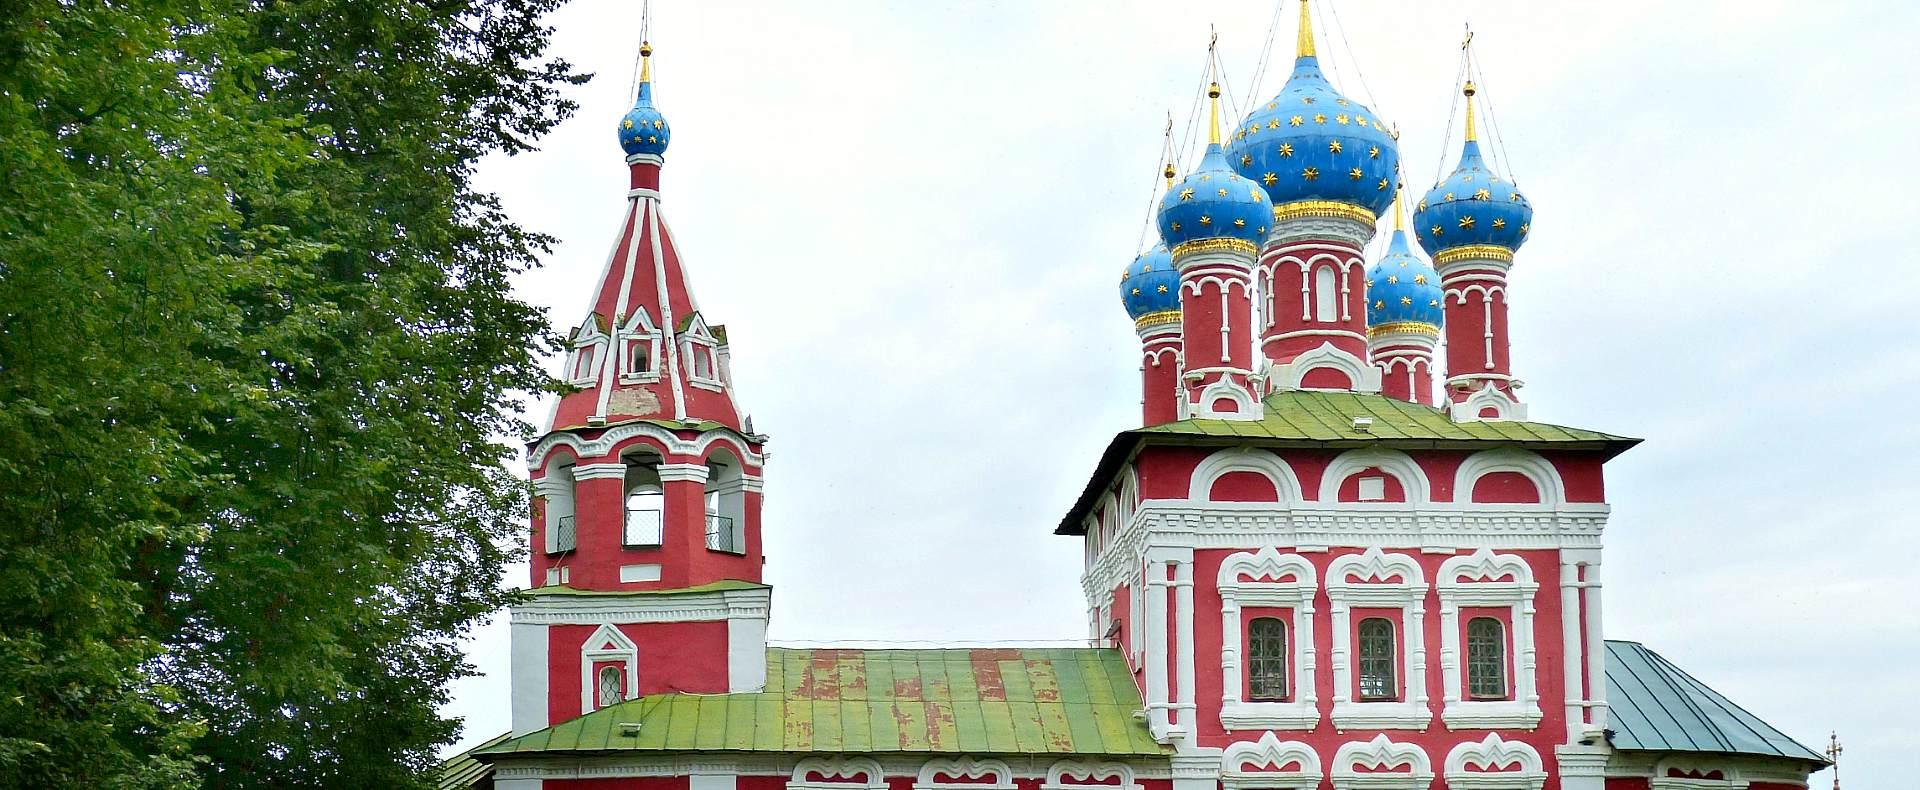 Uglich, Russia